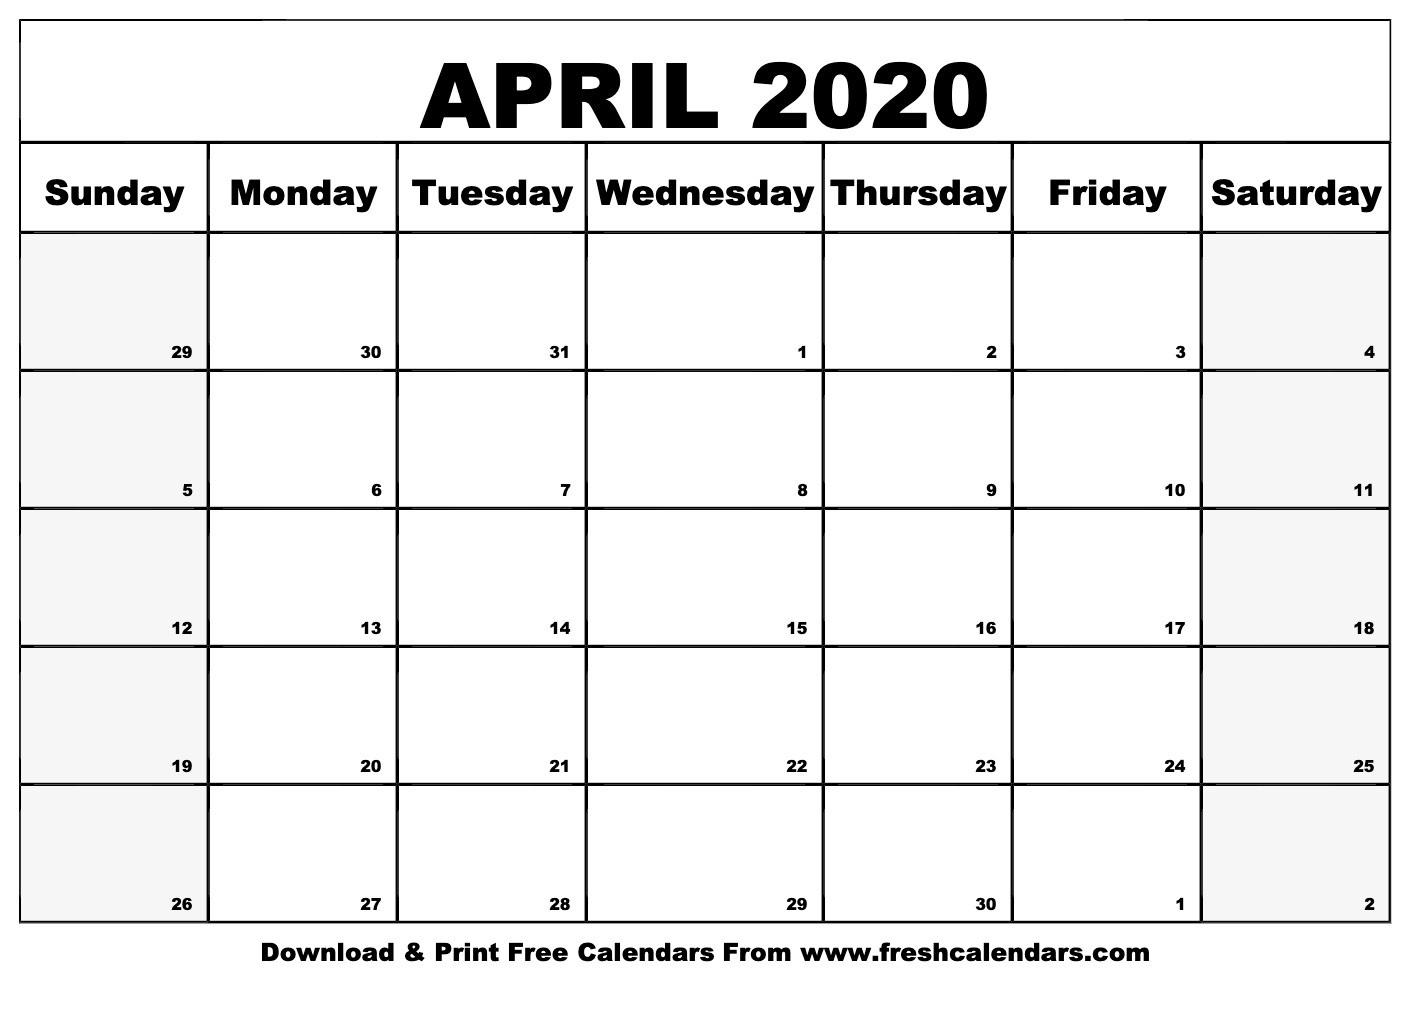 April 2020 Calendar Printable - Fresh Calendars-Fill In Calendar April 2020 Template